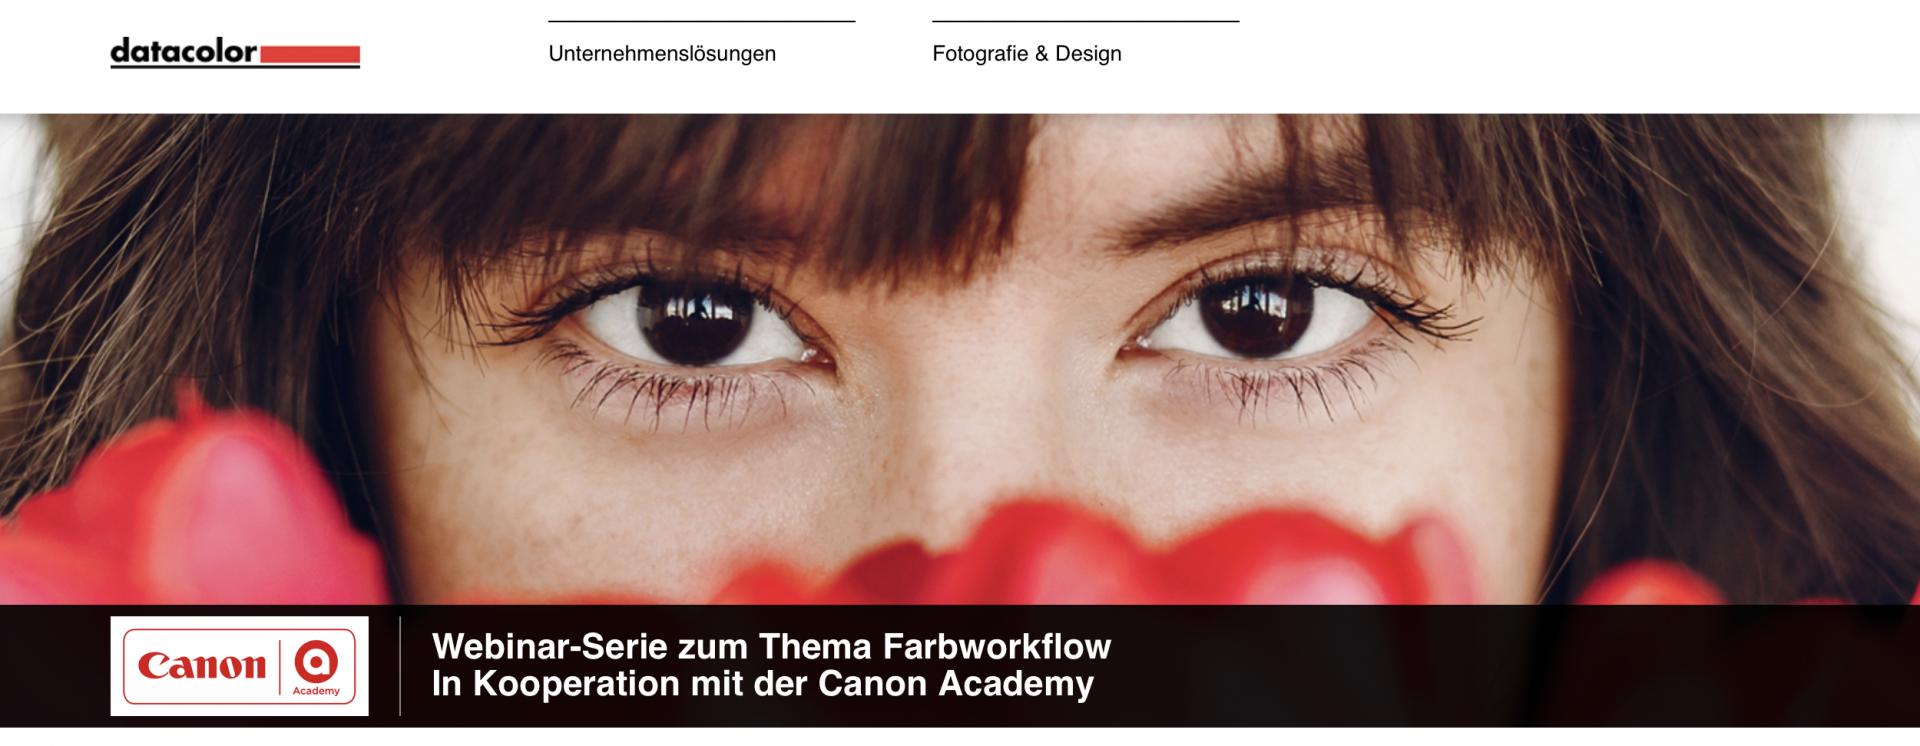 Webinare zum Farbworkflow